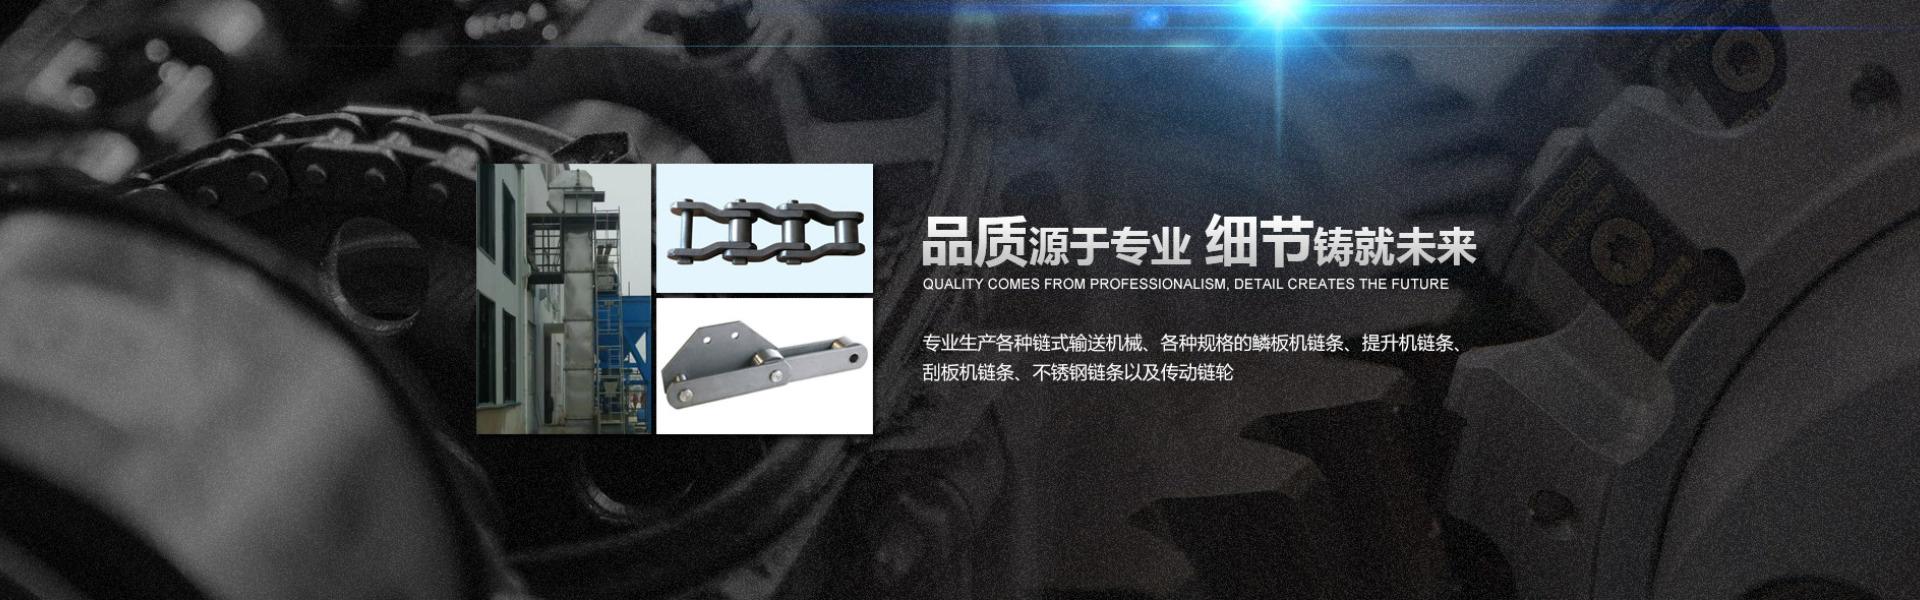 shan东新tai链条changjia